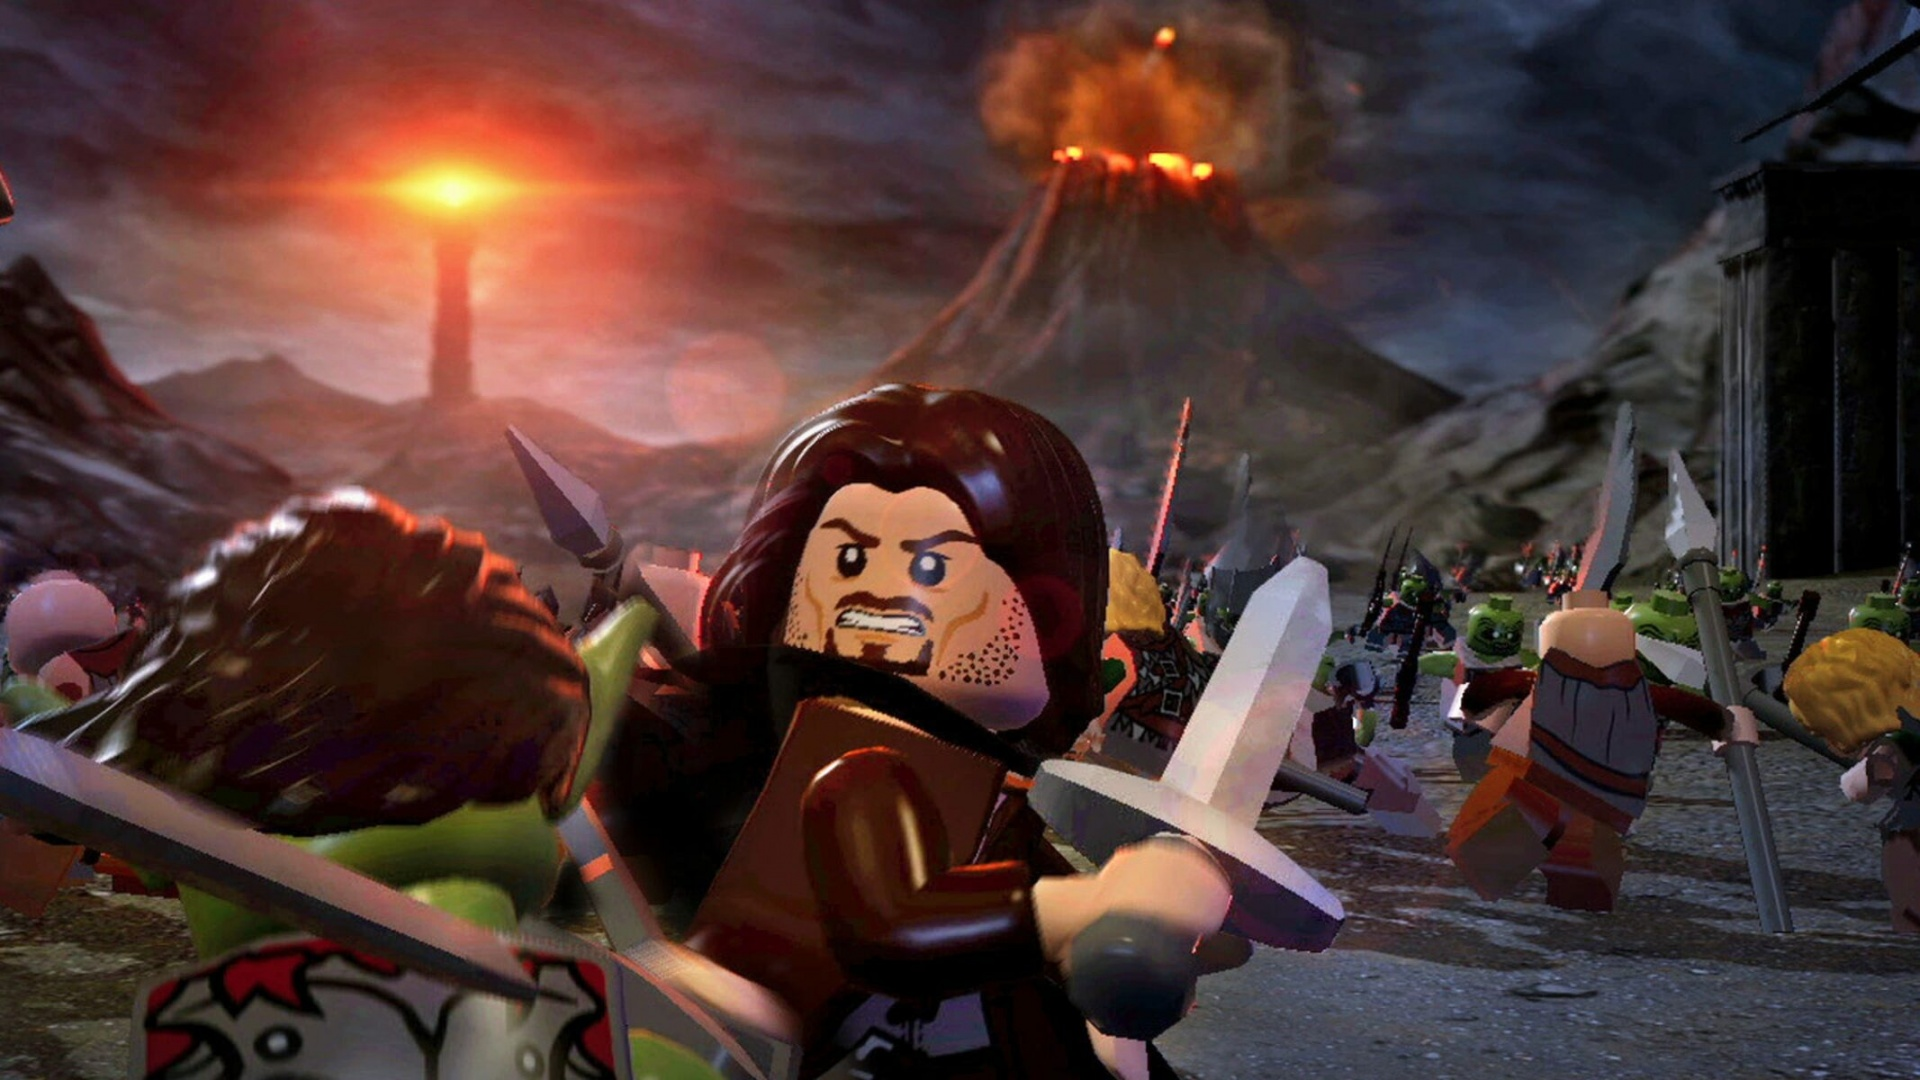 LEGO The Lord of the Rings и LEGO The Hobbit вновь можно купить в Steam